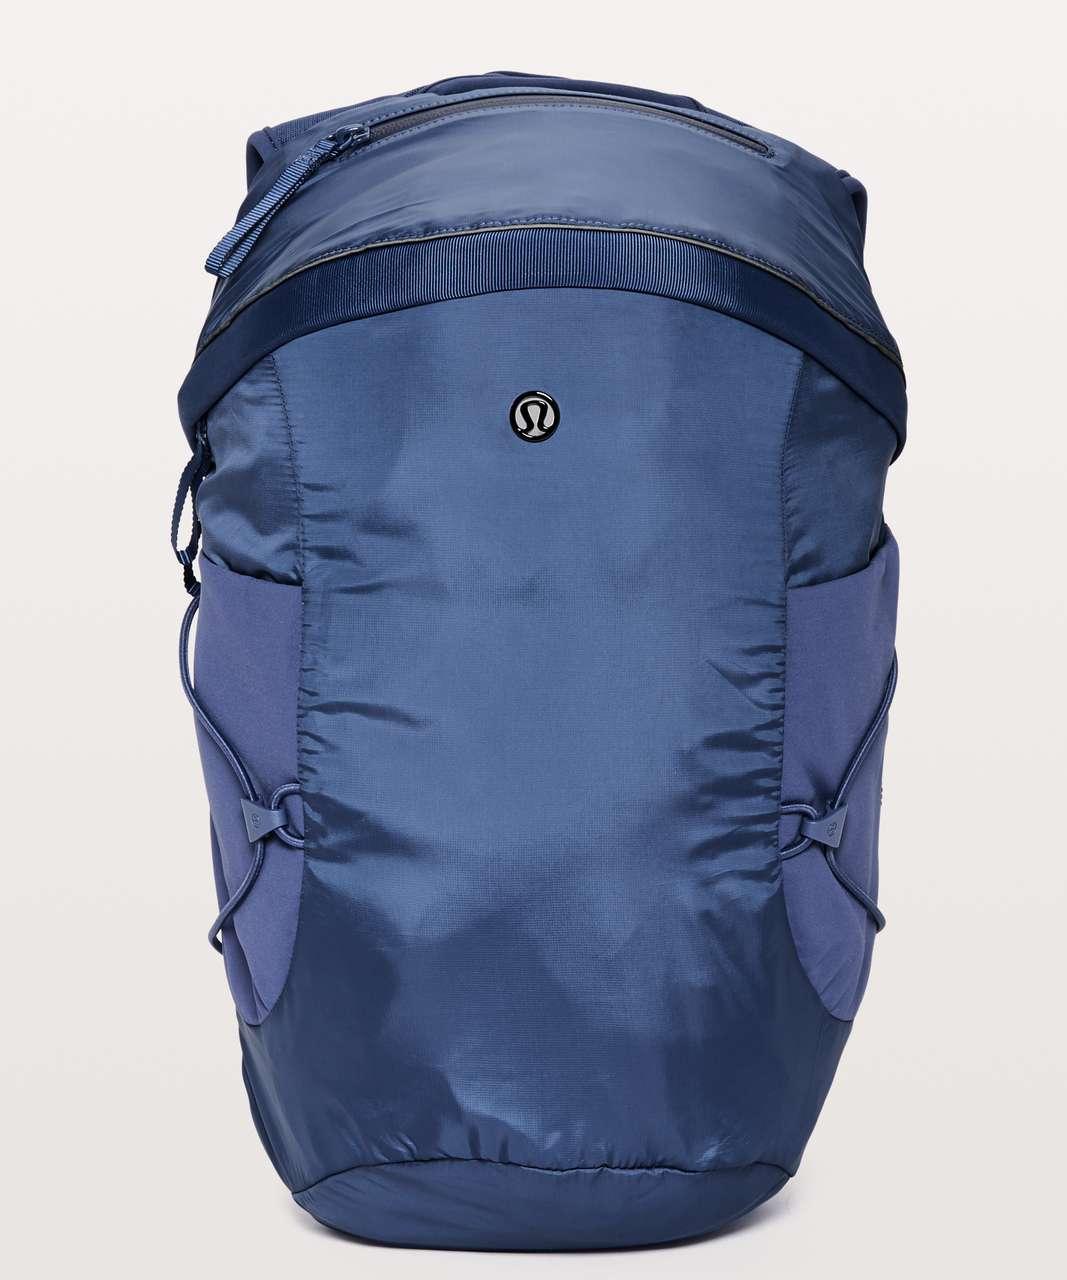 Lululemon Run All Day Backpack II *13L - Gatsby Blue